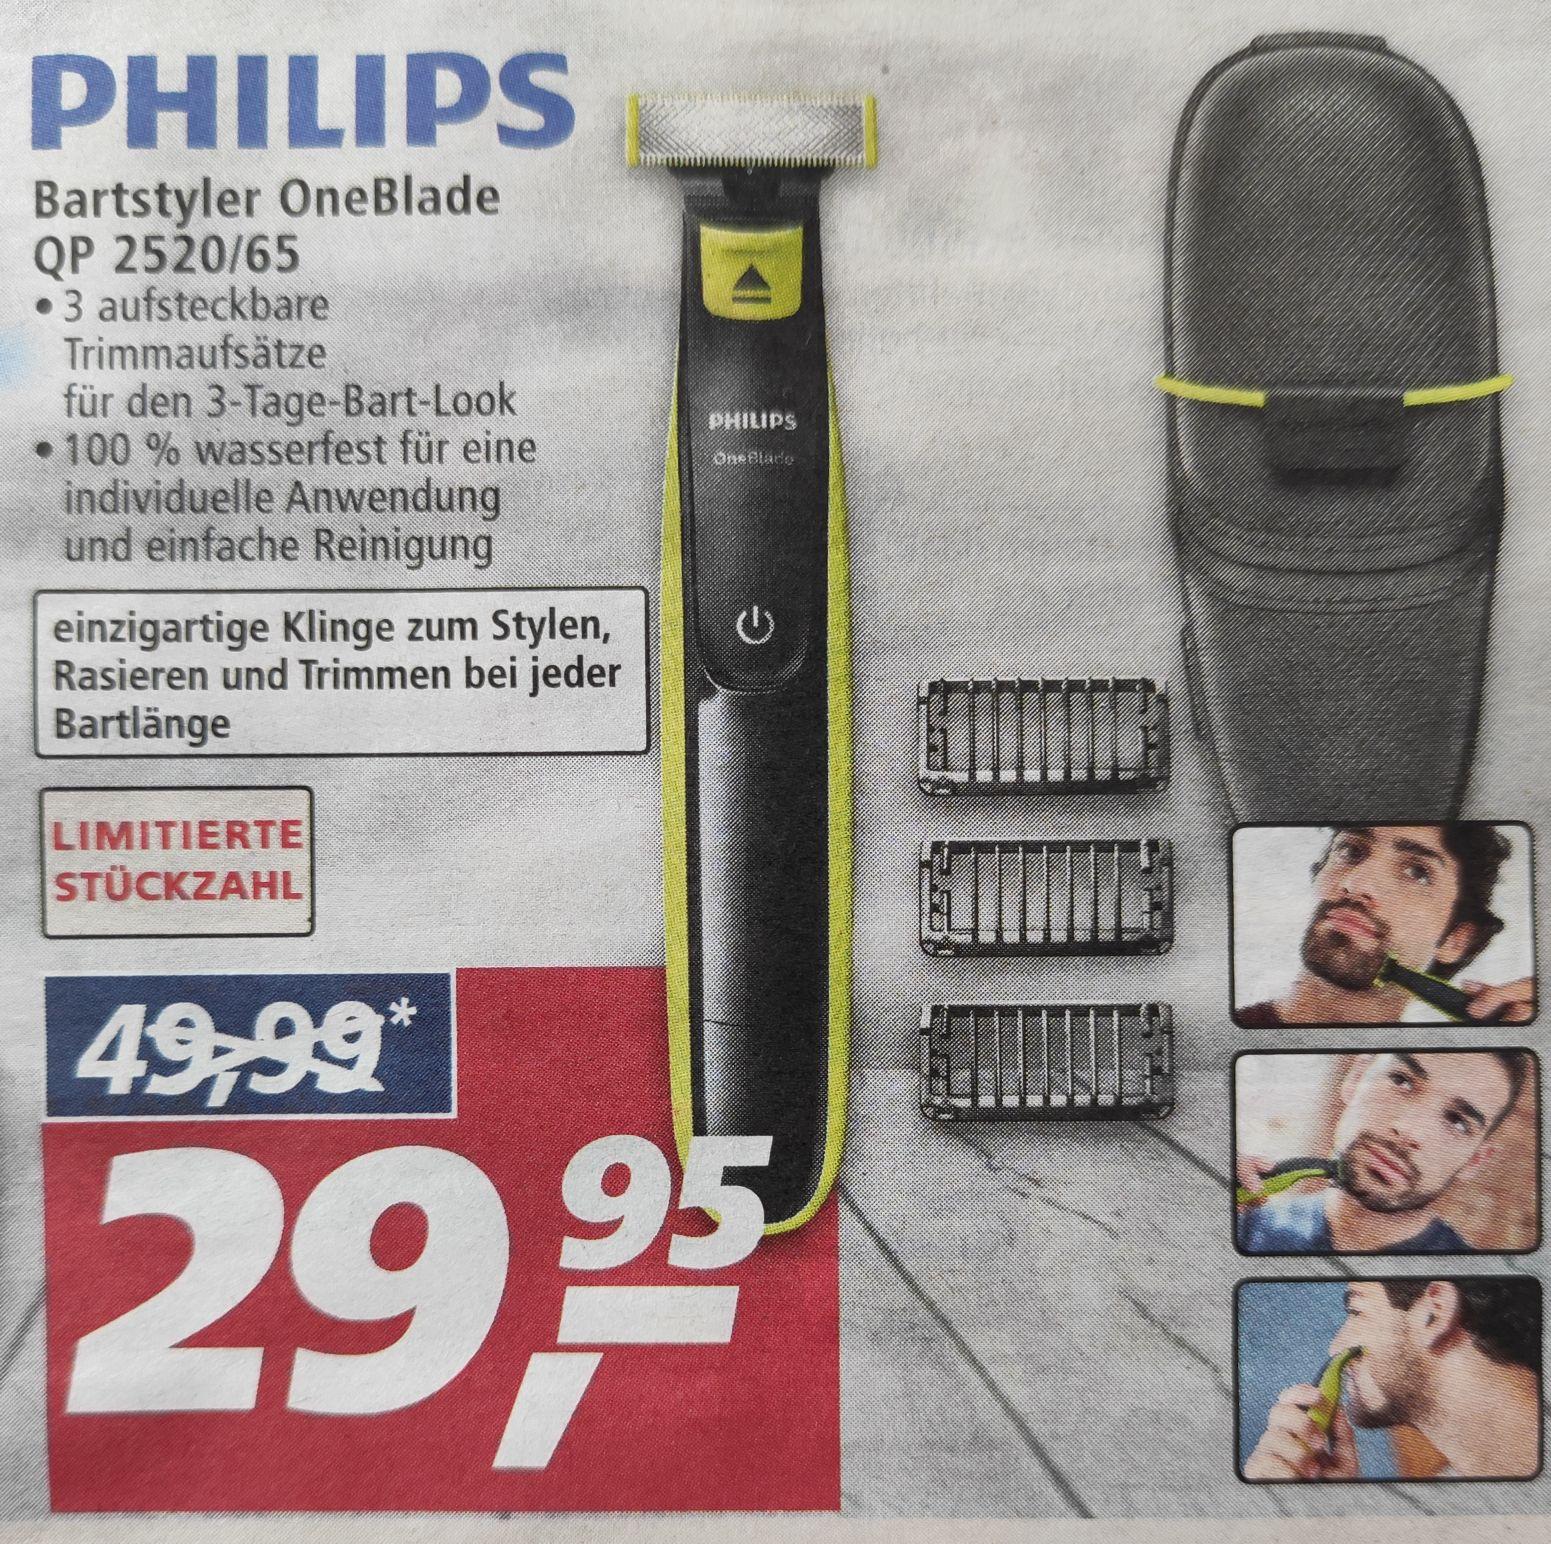 [Lokal / ggf. bundesweit] Philips OneBlade QP2520/65